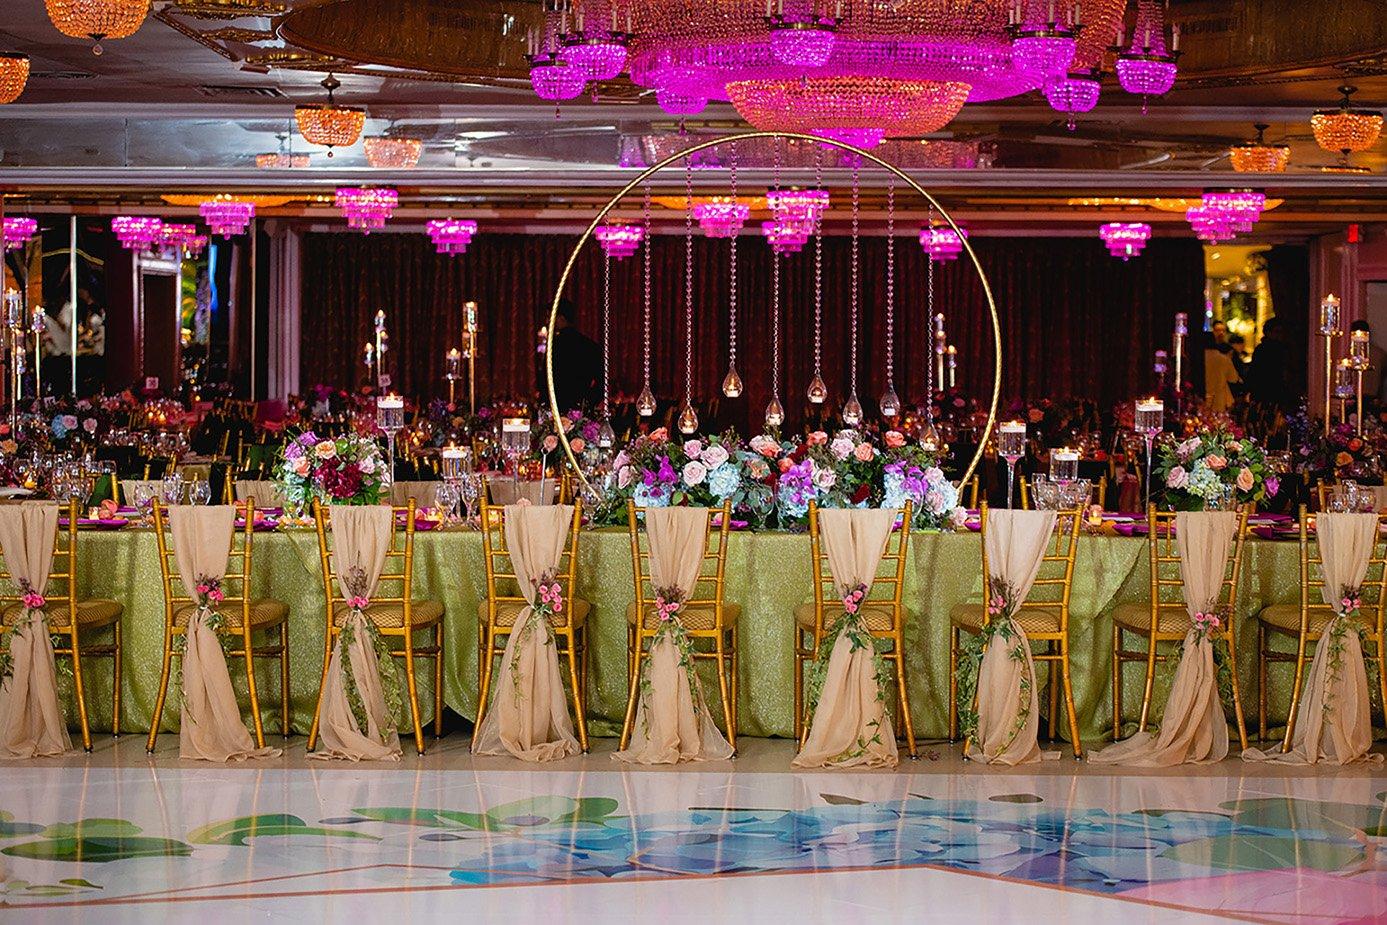 Leonards-Palazzo-Wedding-Photography-Decor Details